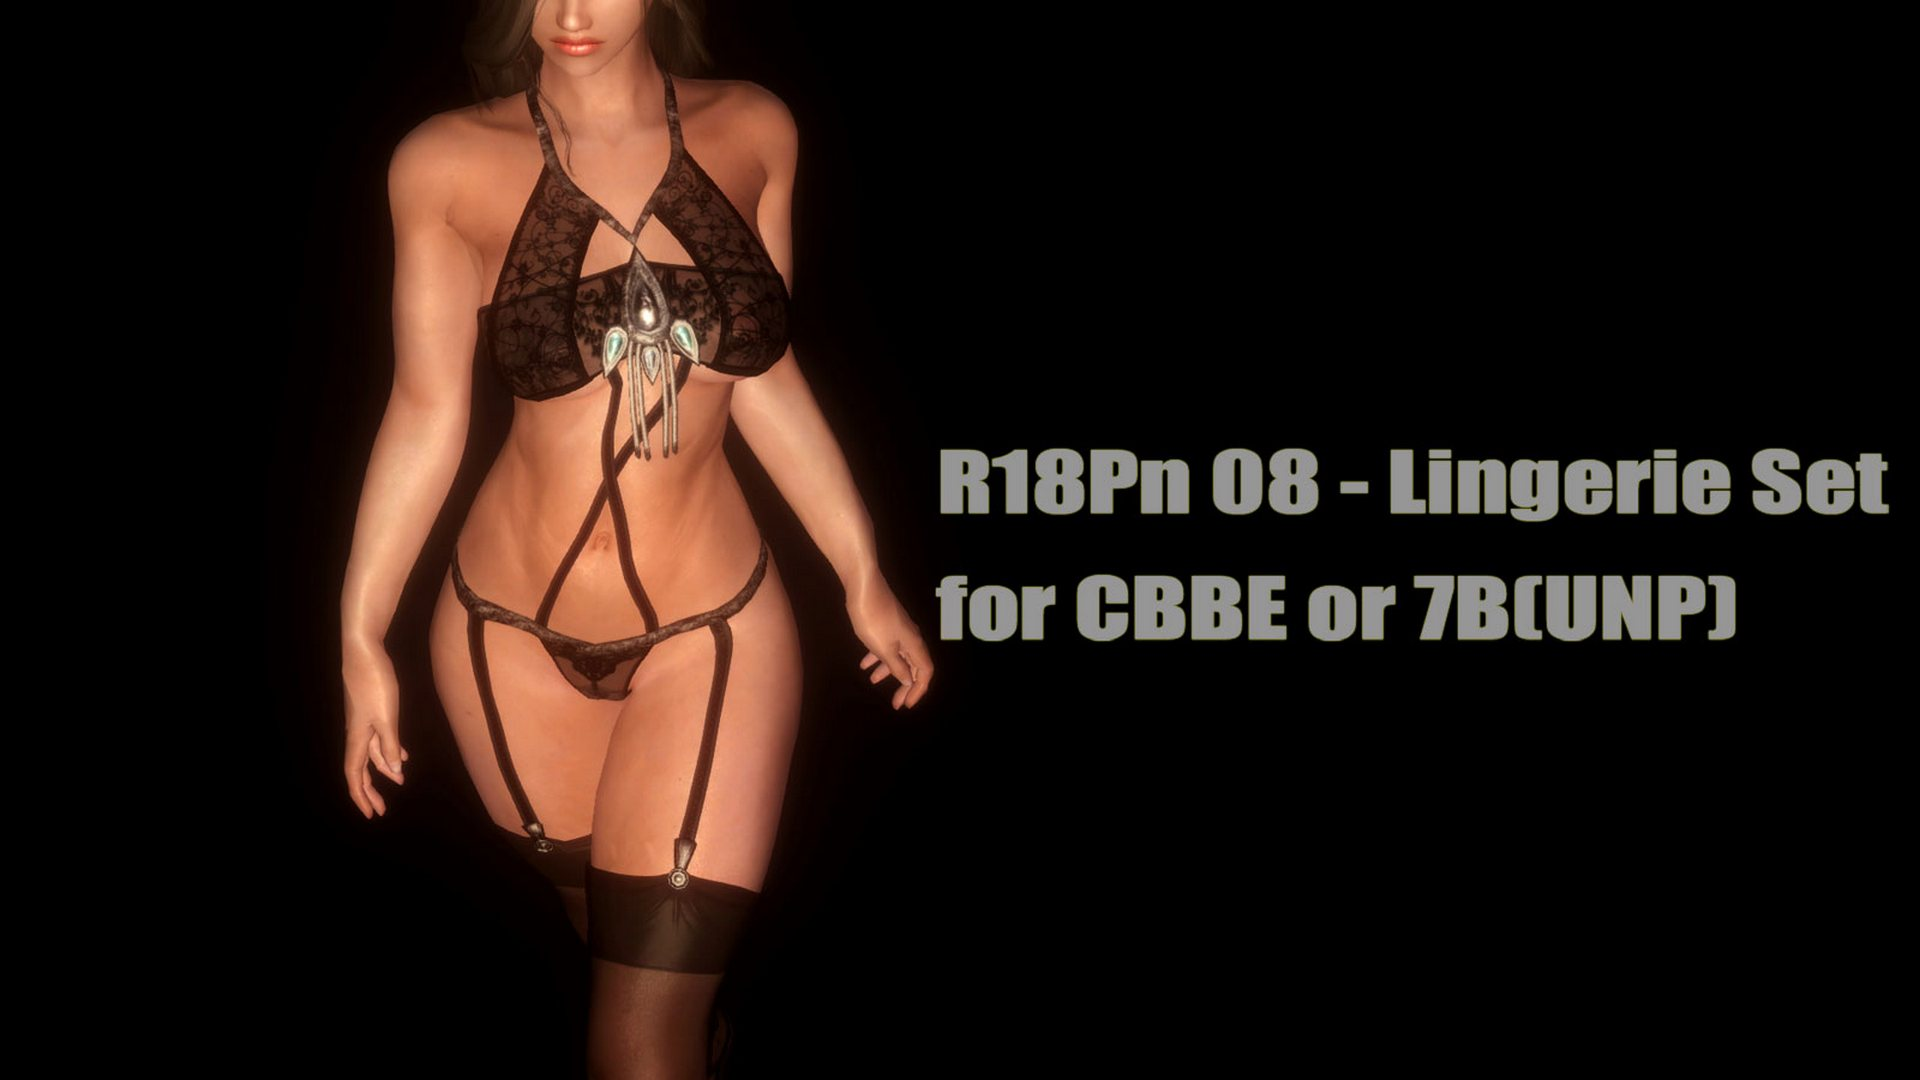 Lingerie_Set_CBBE_7B_UNP.jpg